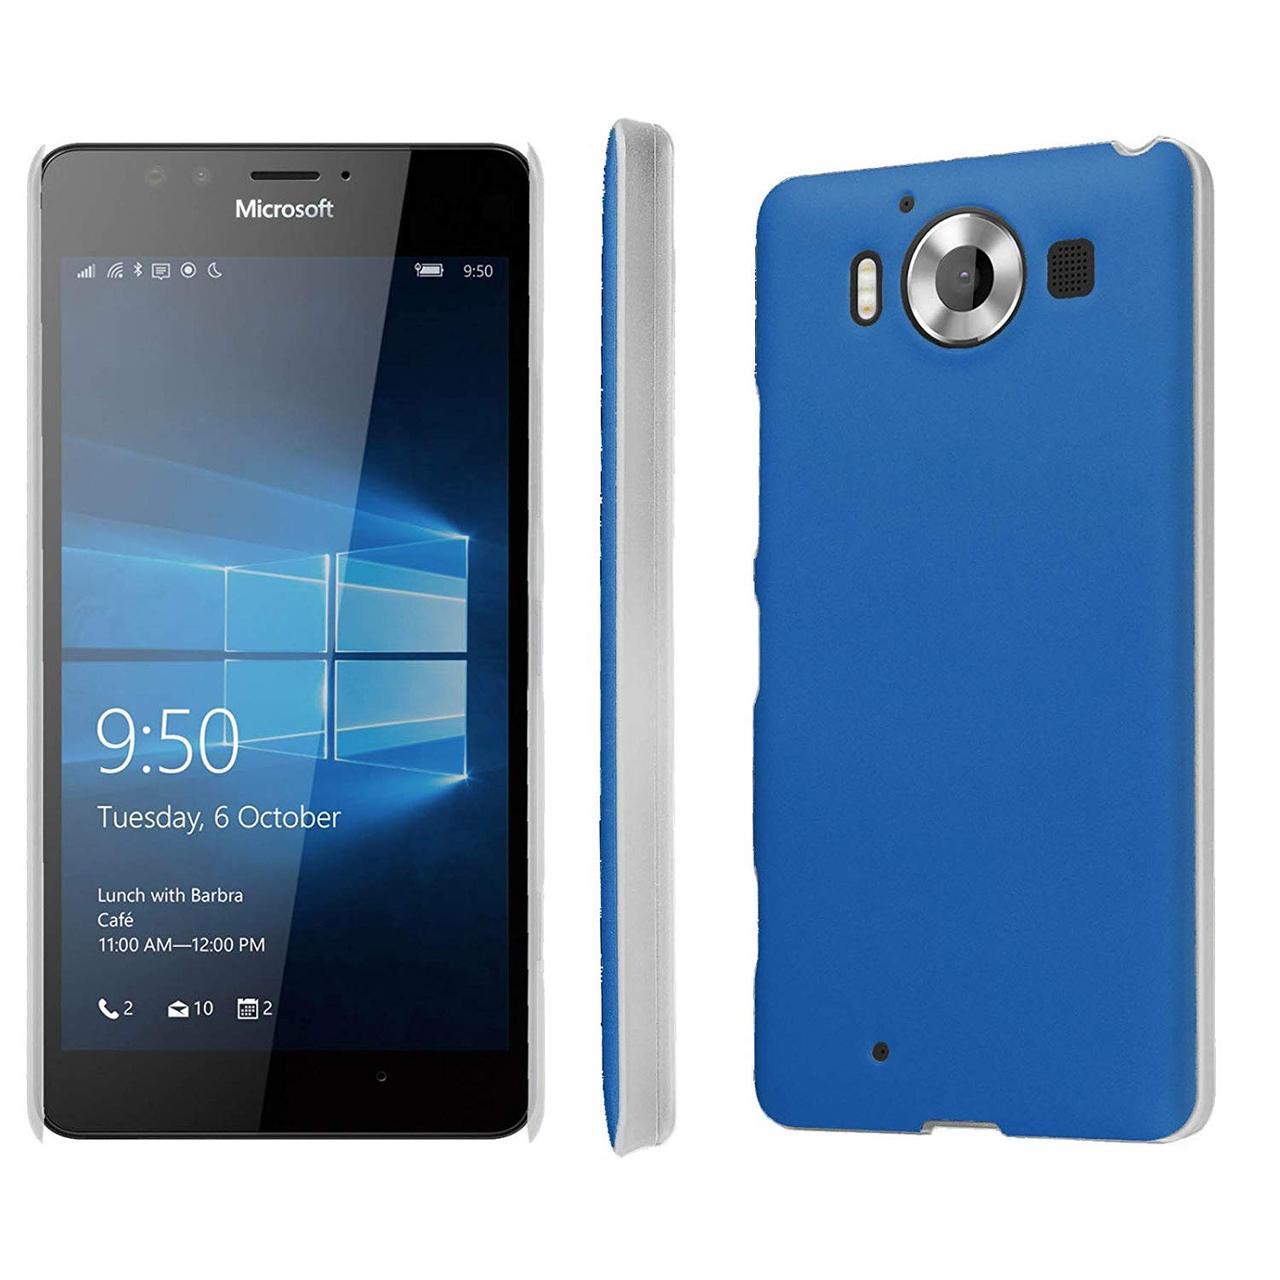 Смартфон Microsoft Lumia 950 Dual SIM Blue 3/32gb 3000 мАч Snapdragon 808 + подарки